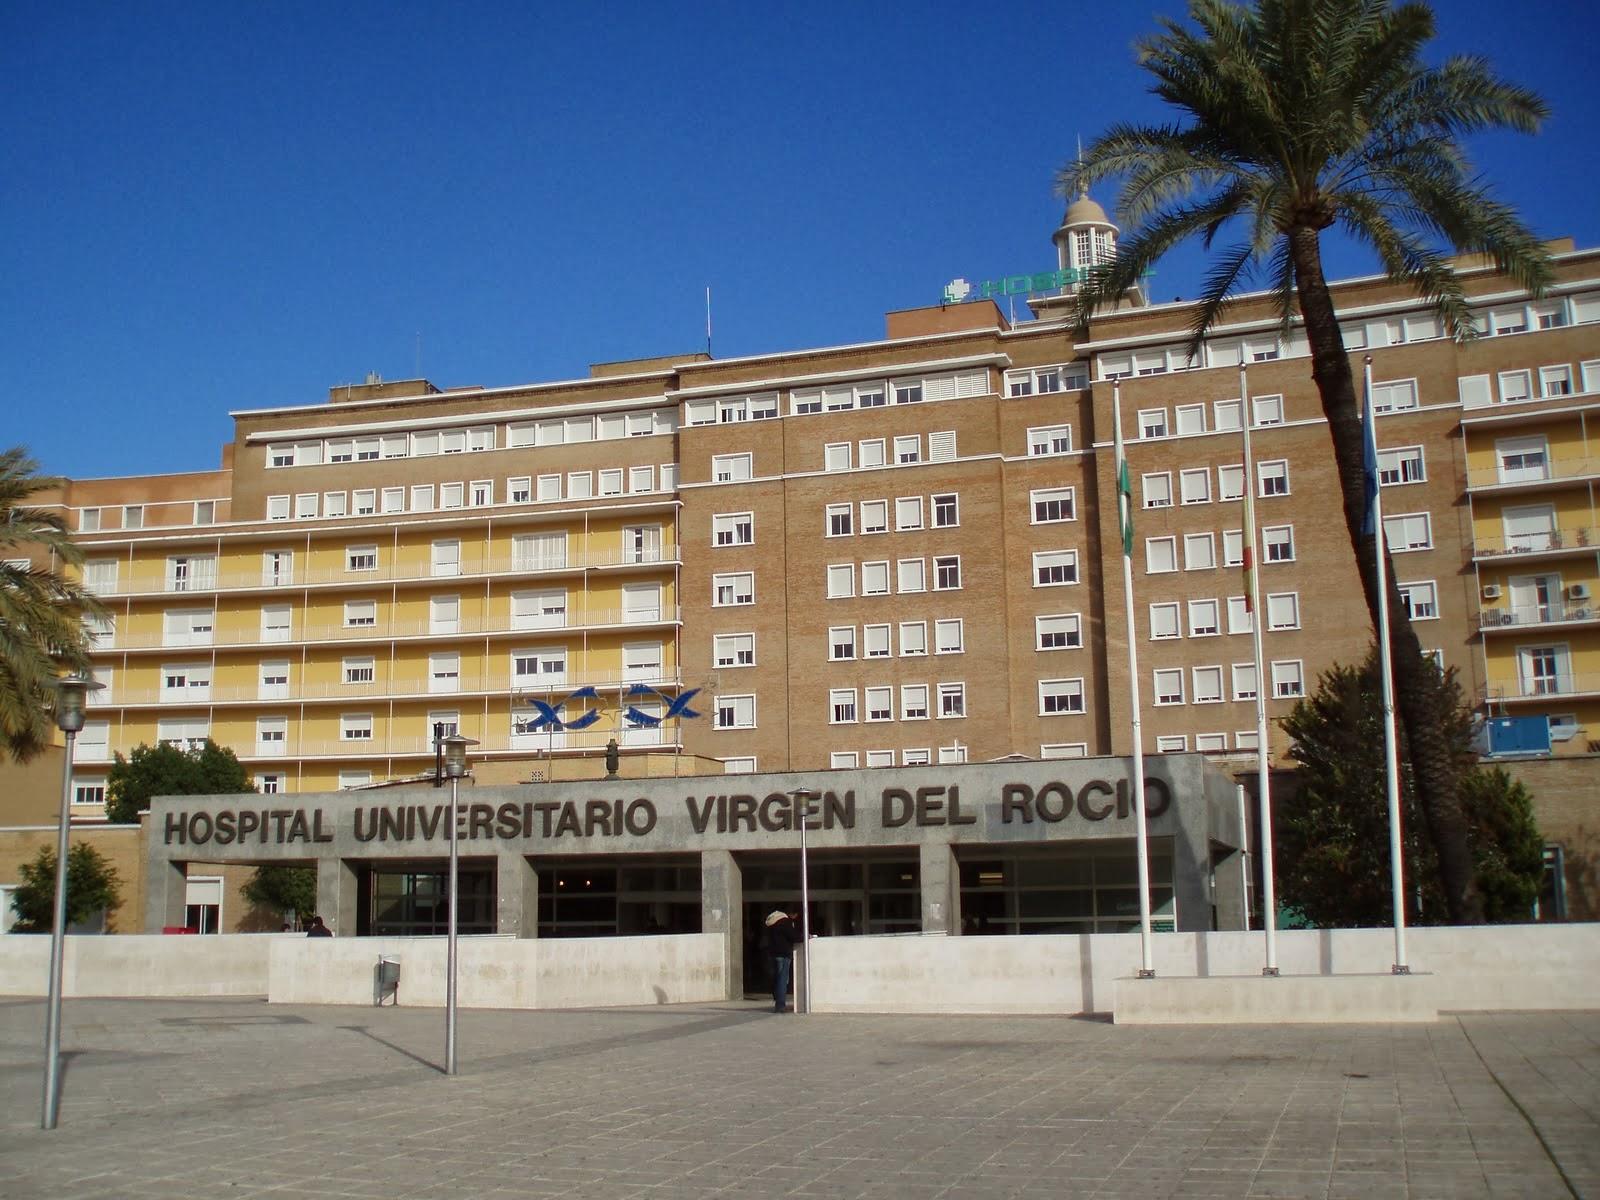 Croix hospital isla st virgen